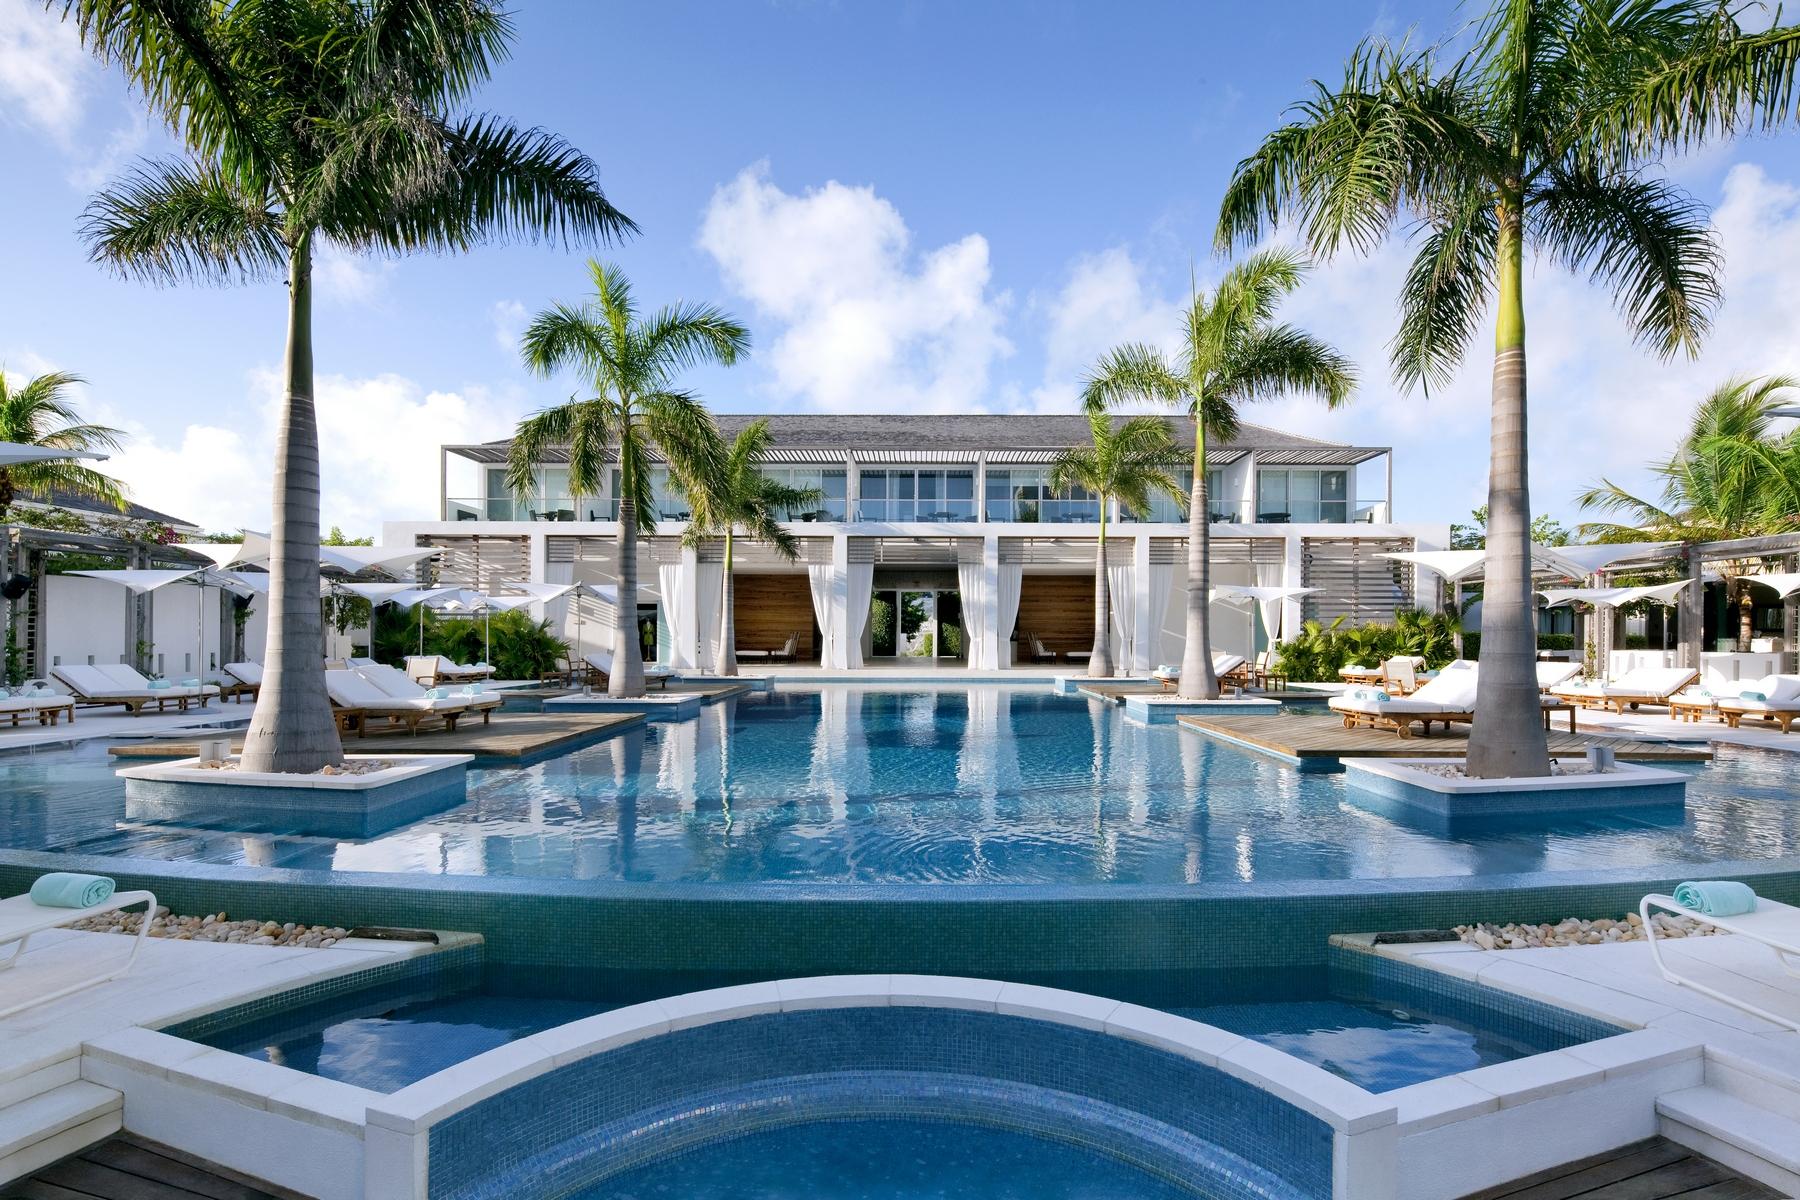 Additional photo for property listing at Gansevoort Villa - 5 Bedroom Design Waterfront Turtle Tail, 普罗维登夏 TCI 特克斯和凯科斯群岛